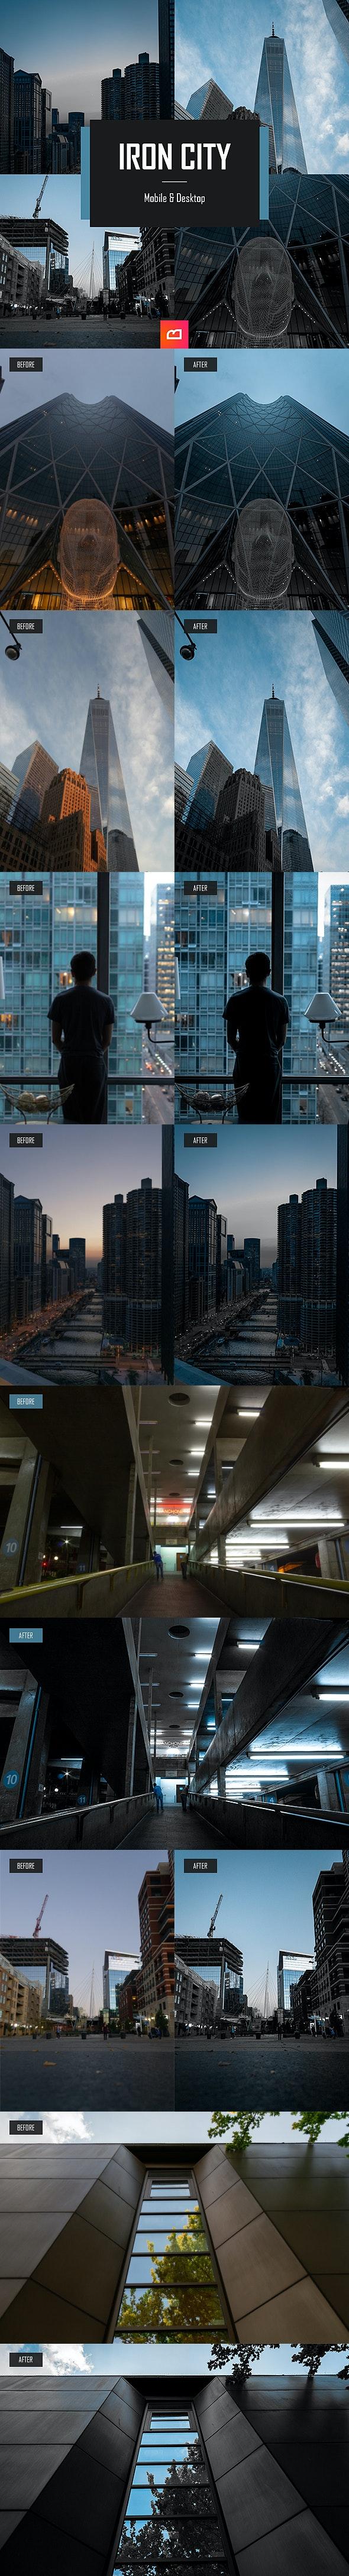 Architecture Collection - Iron City Lightroom Preset (Mobile & Desktop) - Landscape Lightroom Presets